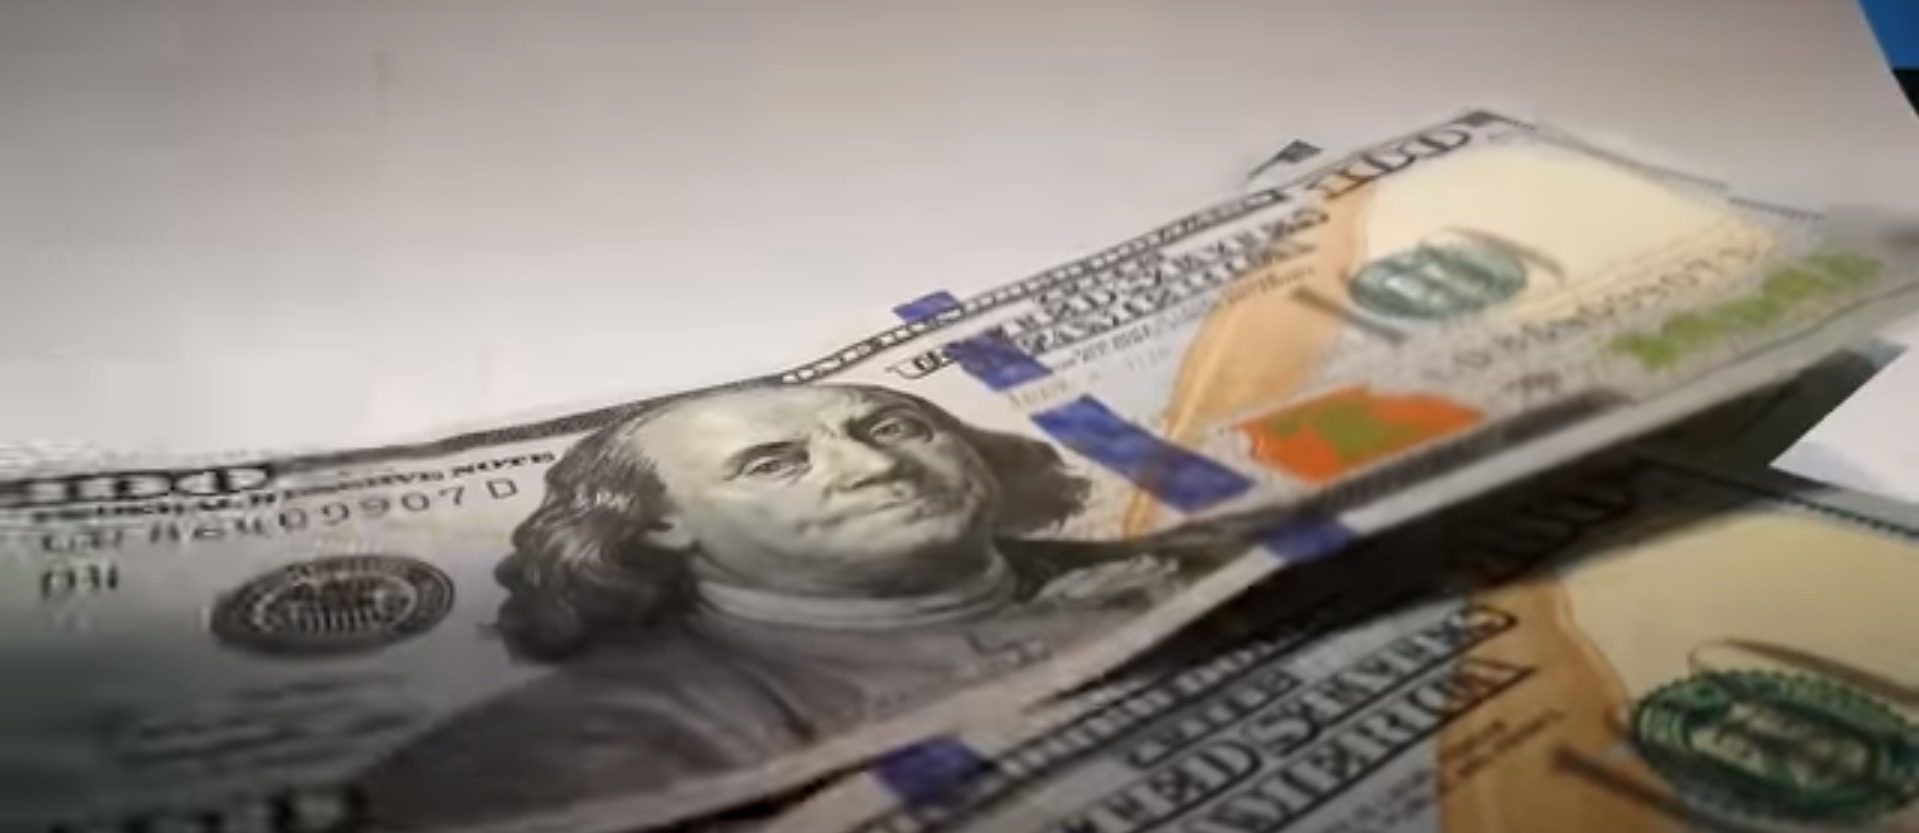 доллар доход бизнес